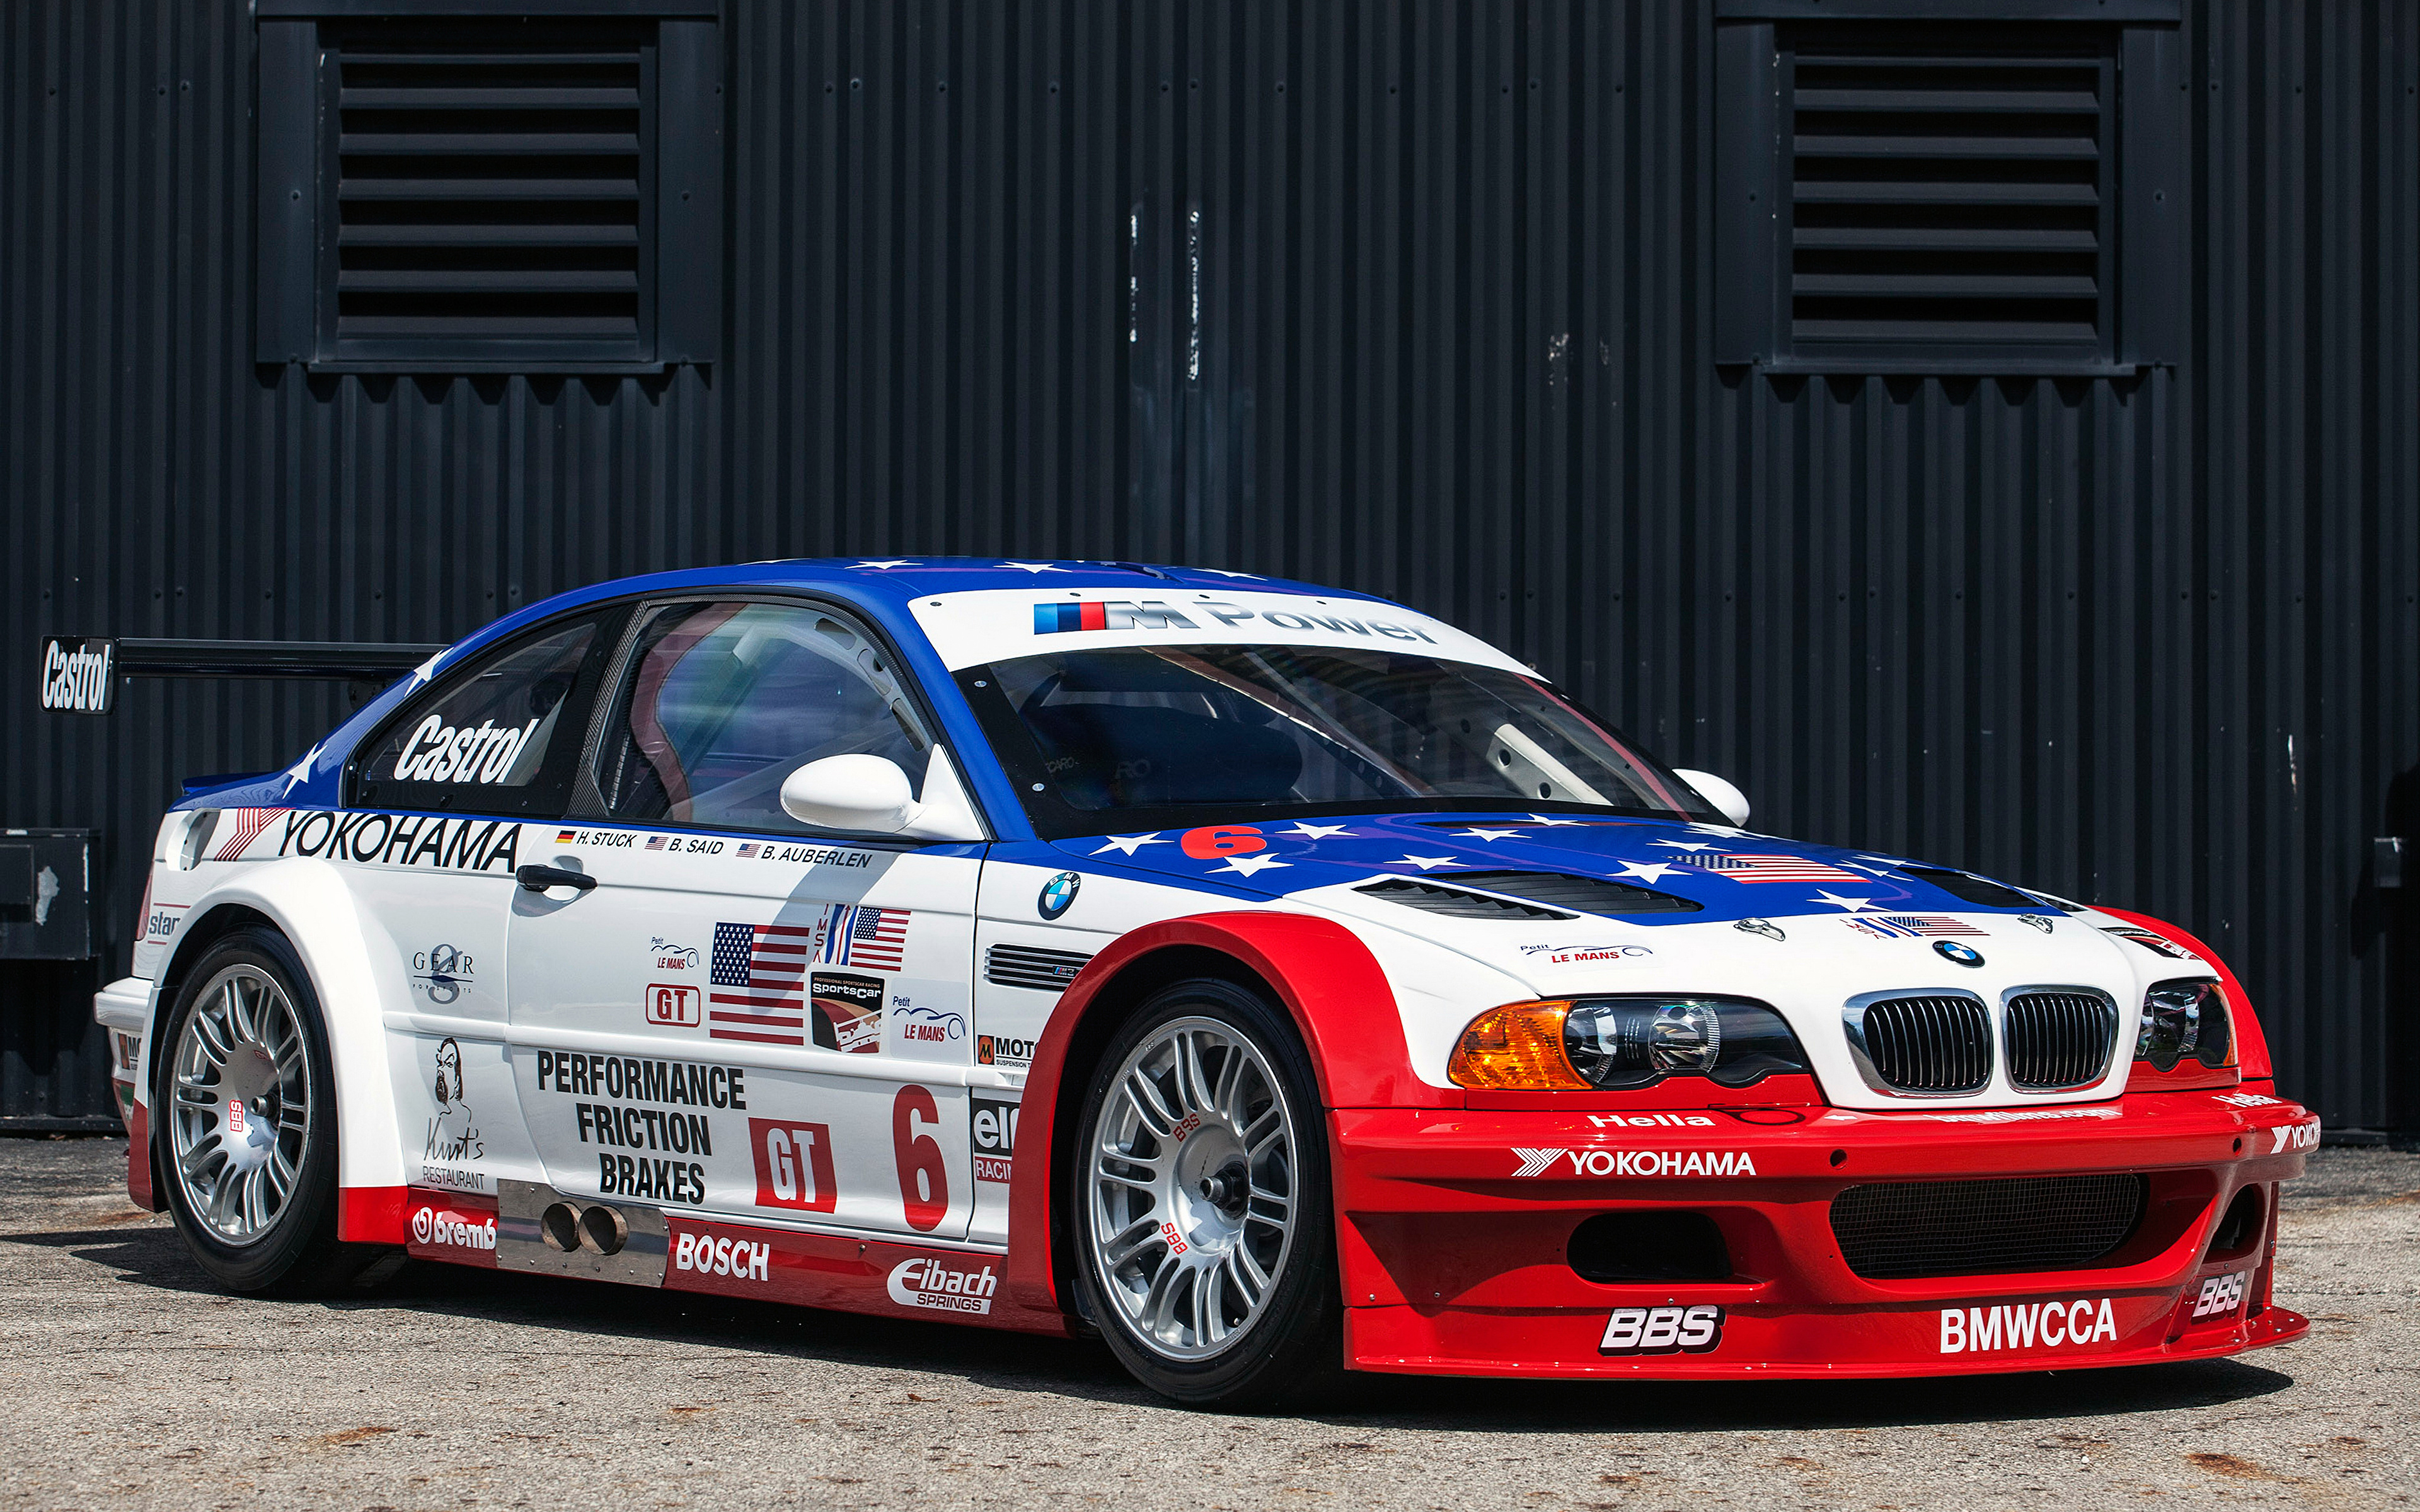 BMW_M3_GTR_469575_3840x2400.jpg